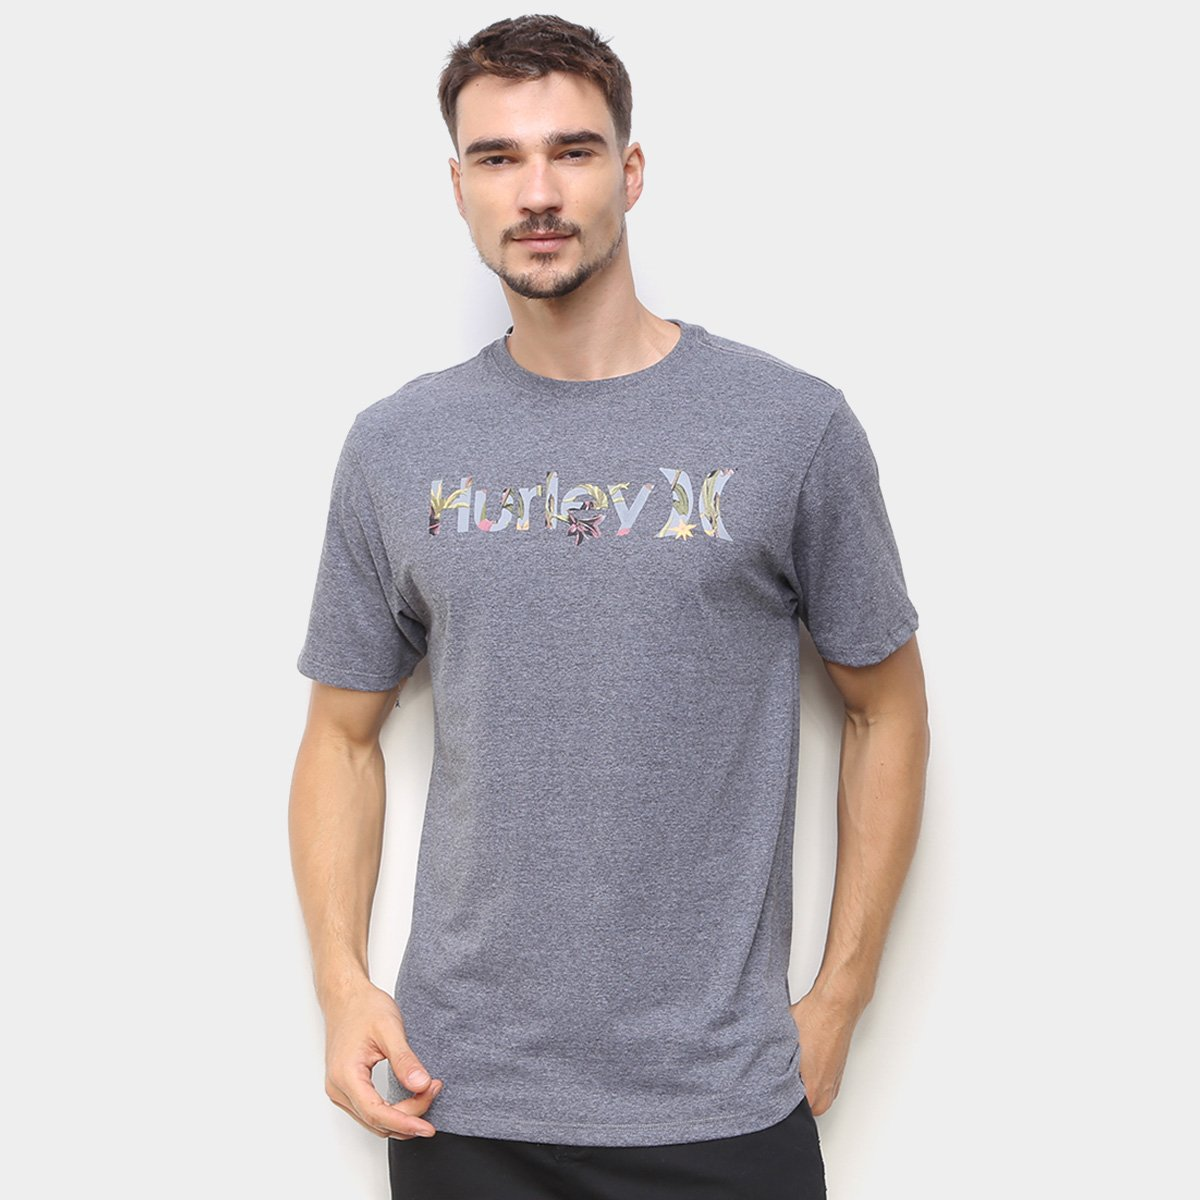 Camiseta Hurley Inside Masculina